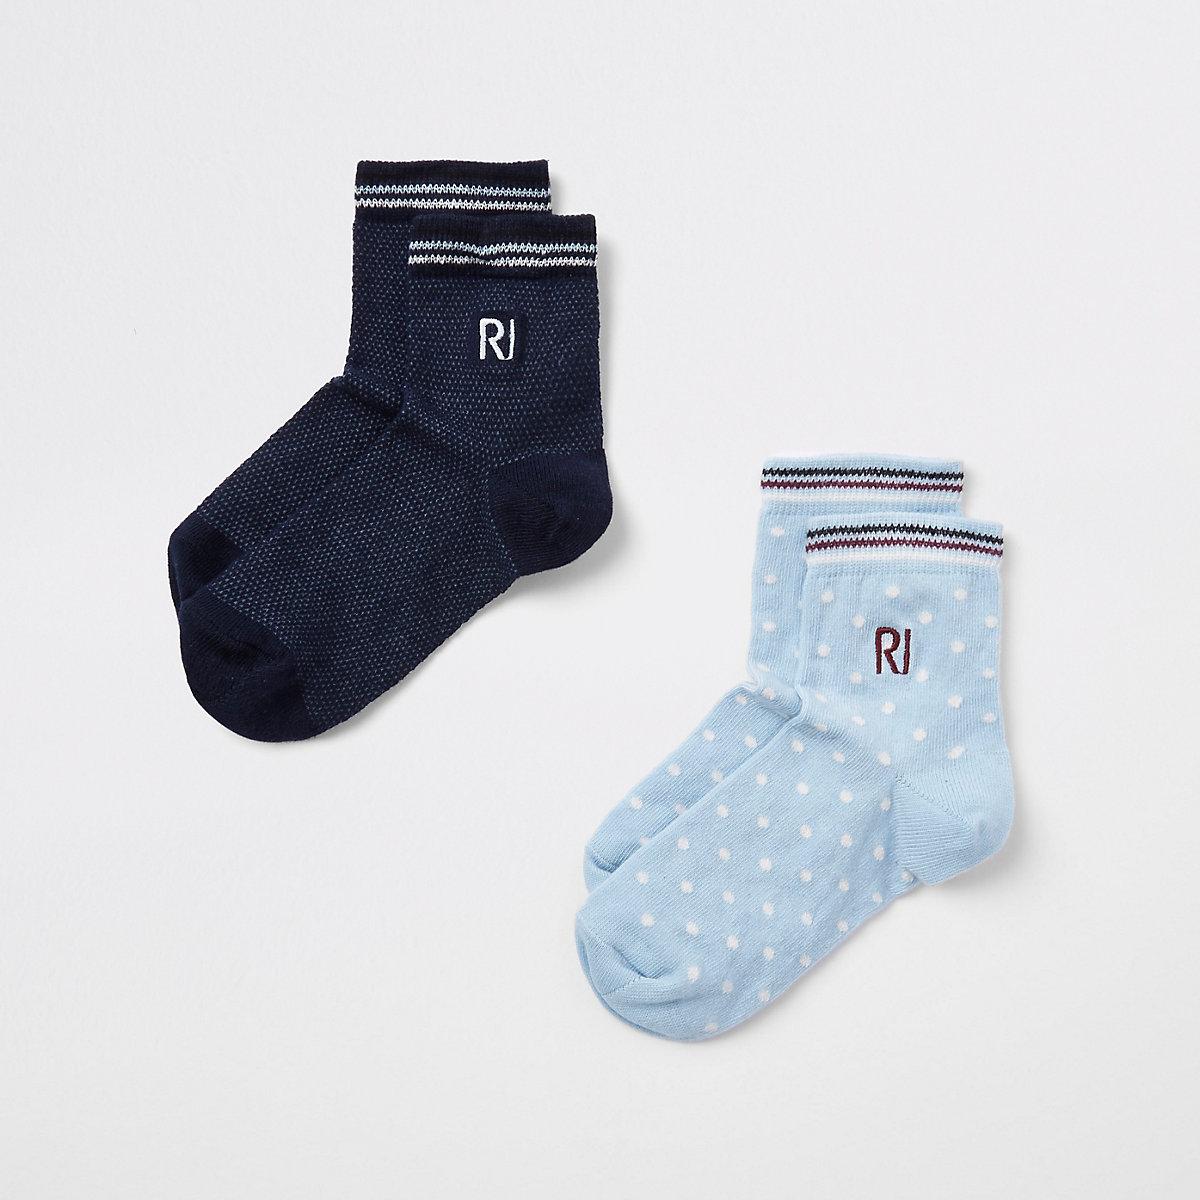 Boys navy spot 'RI' embroidered socks pack